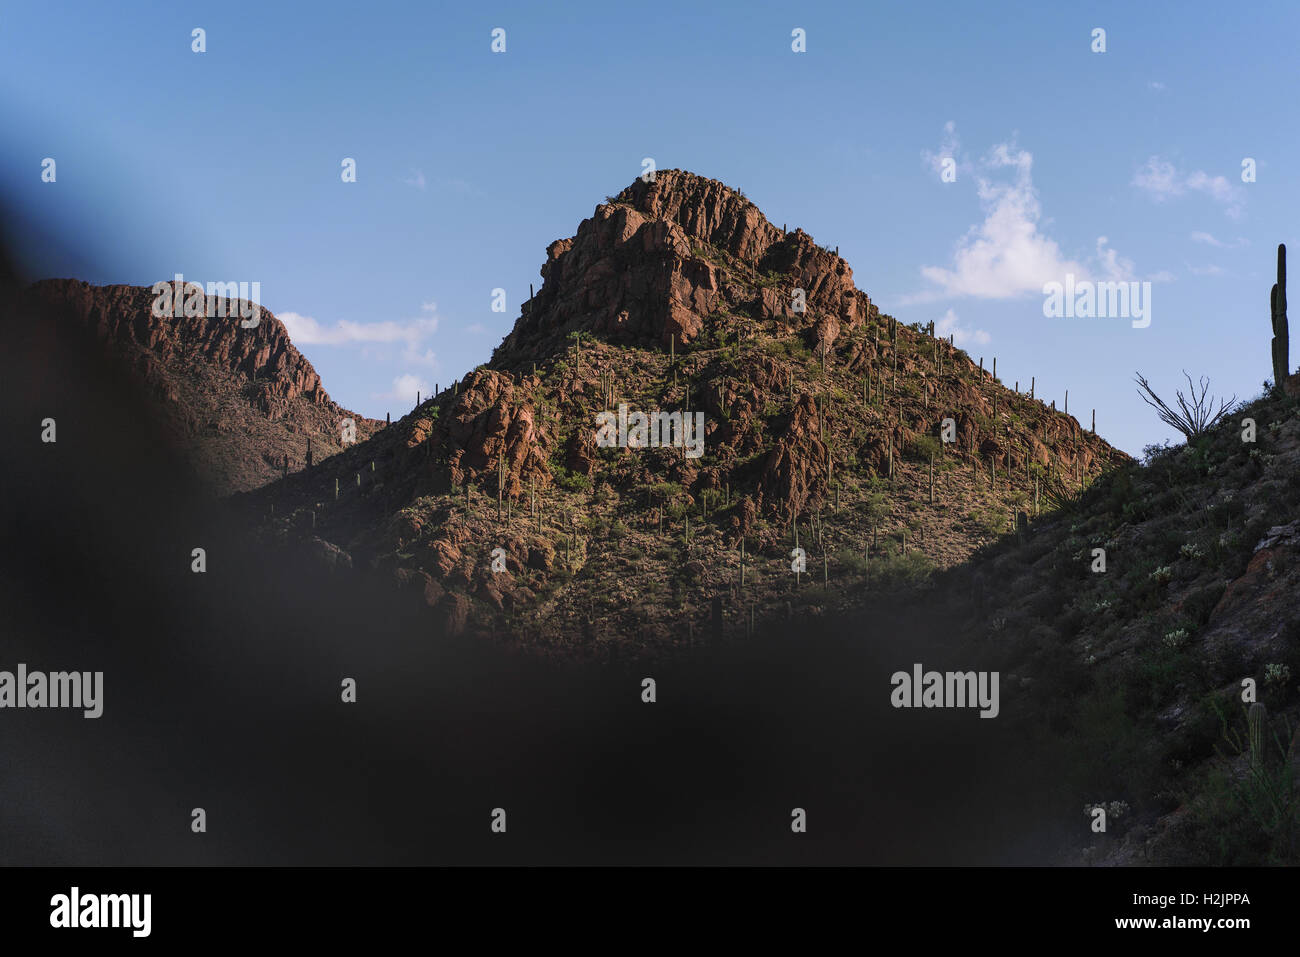 Saguaro National Park - Stock Image